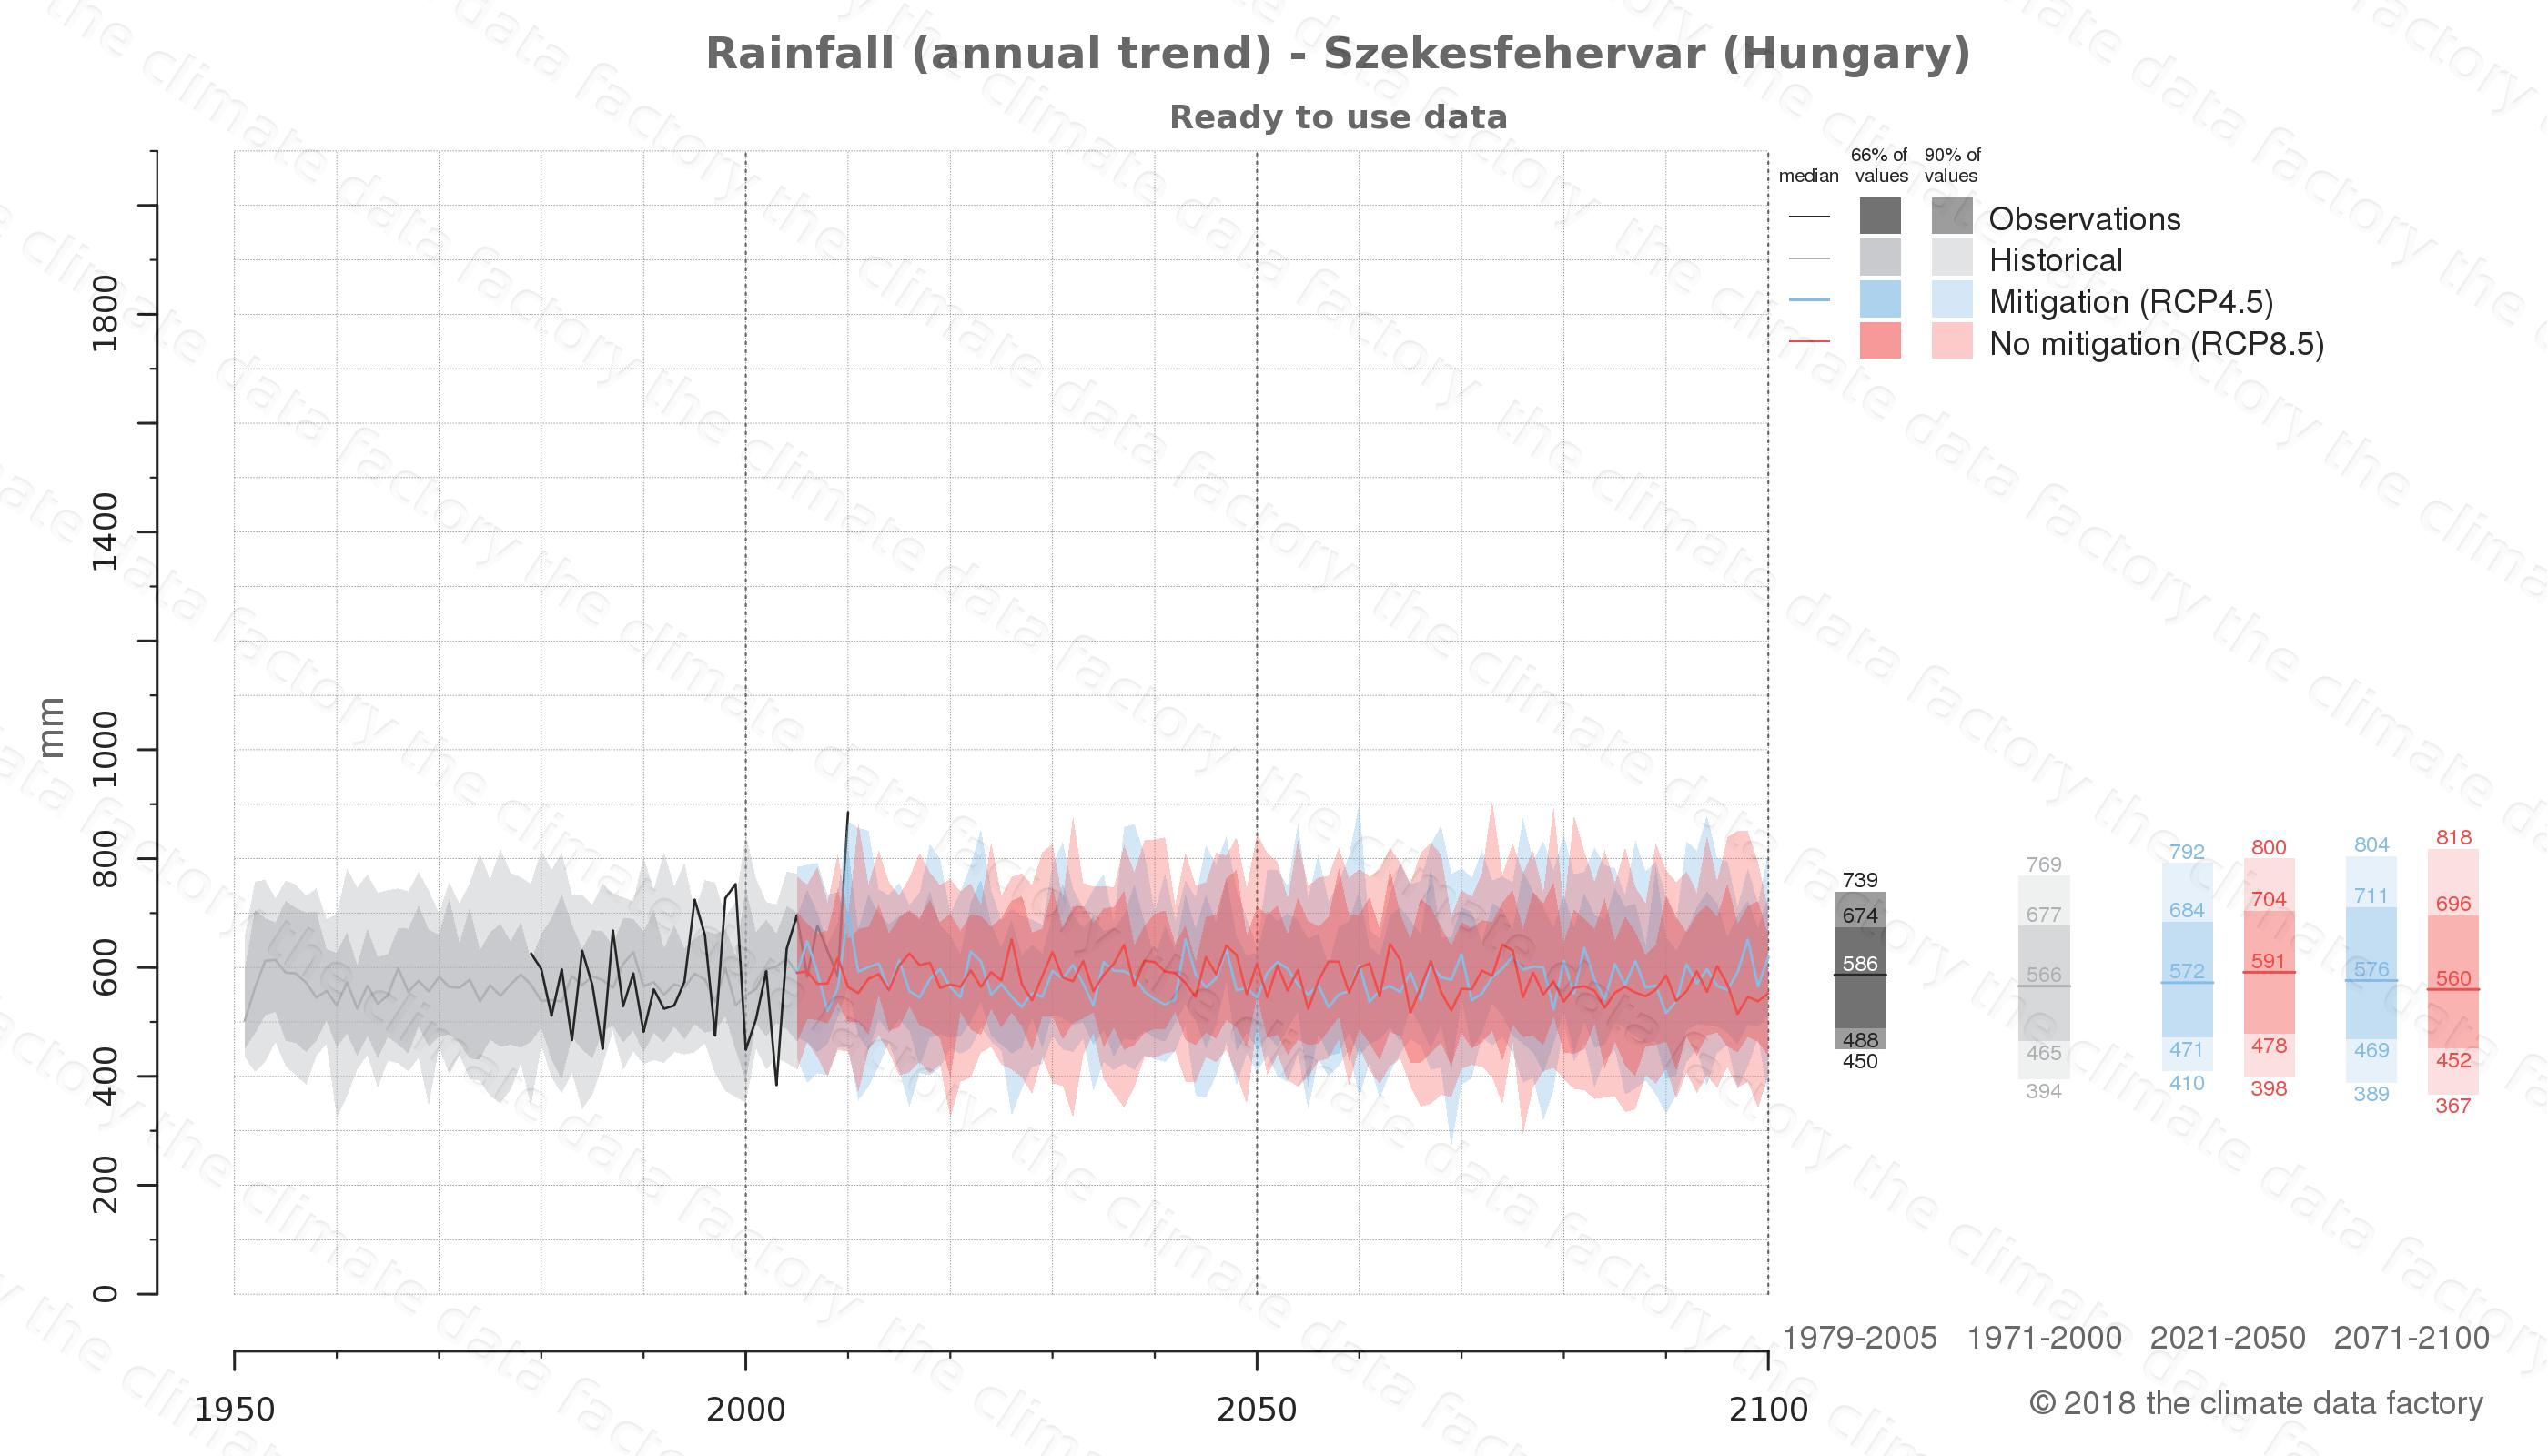 climate change data policy adaptation climate graph city data rainfall szekesfehervar hungary